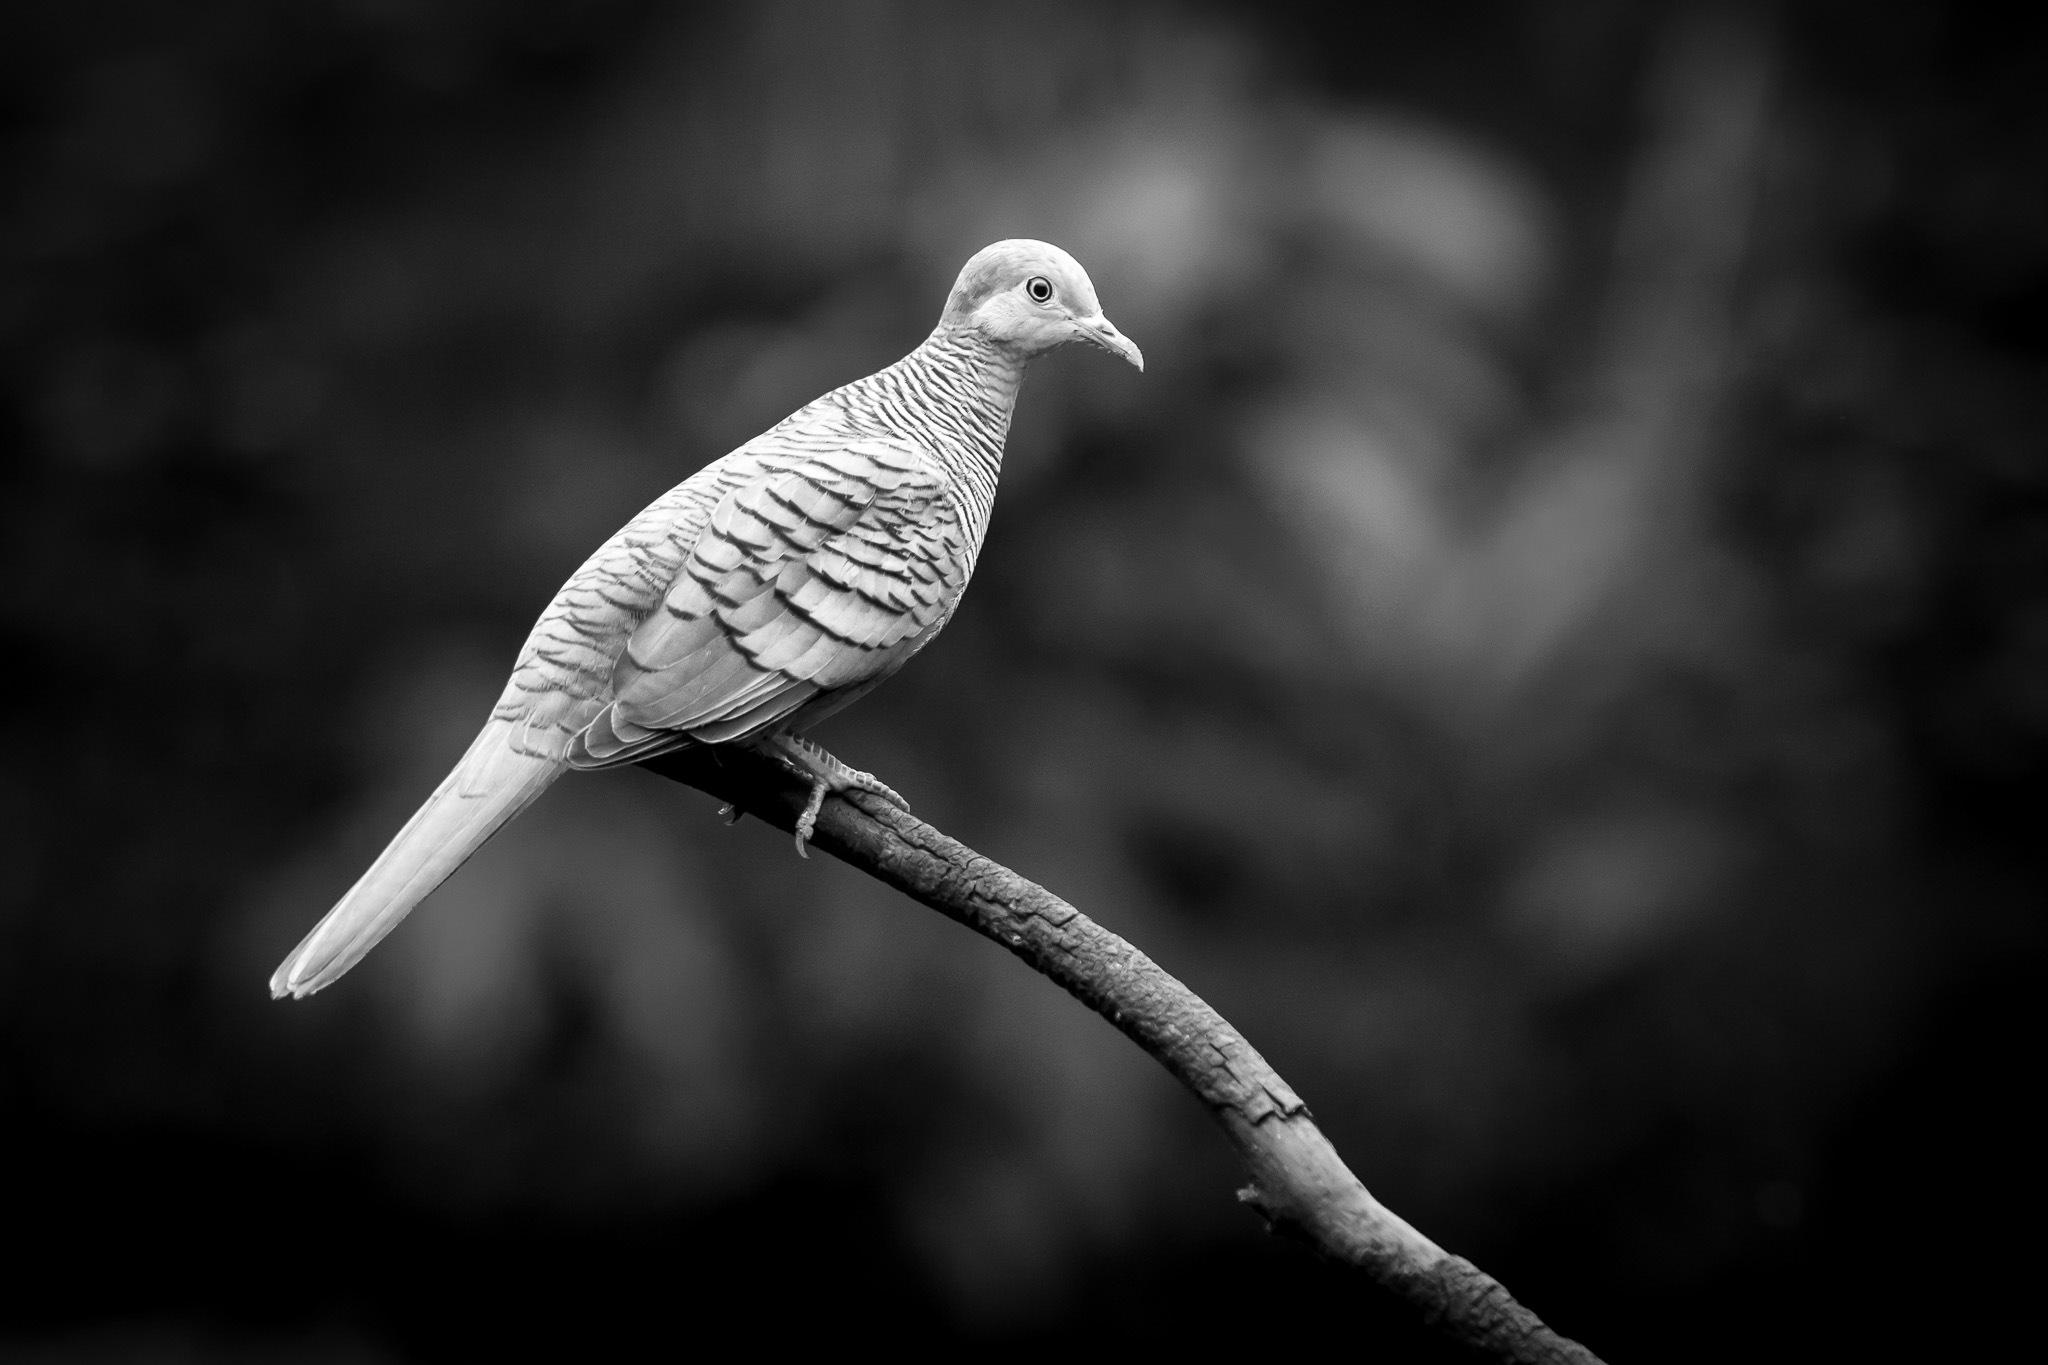 Bird in B&W by Ouioui Ouiouiphoto